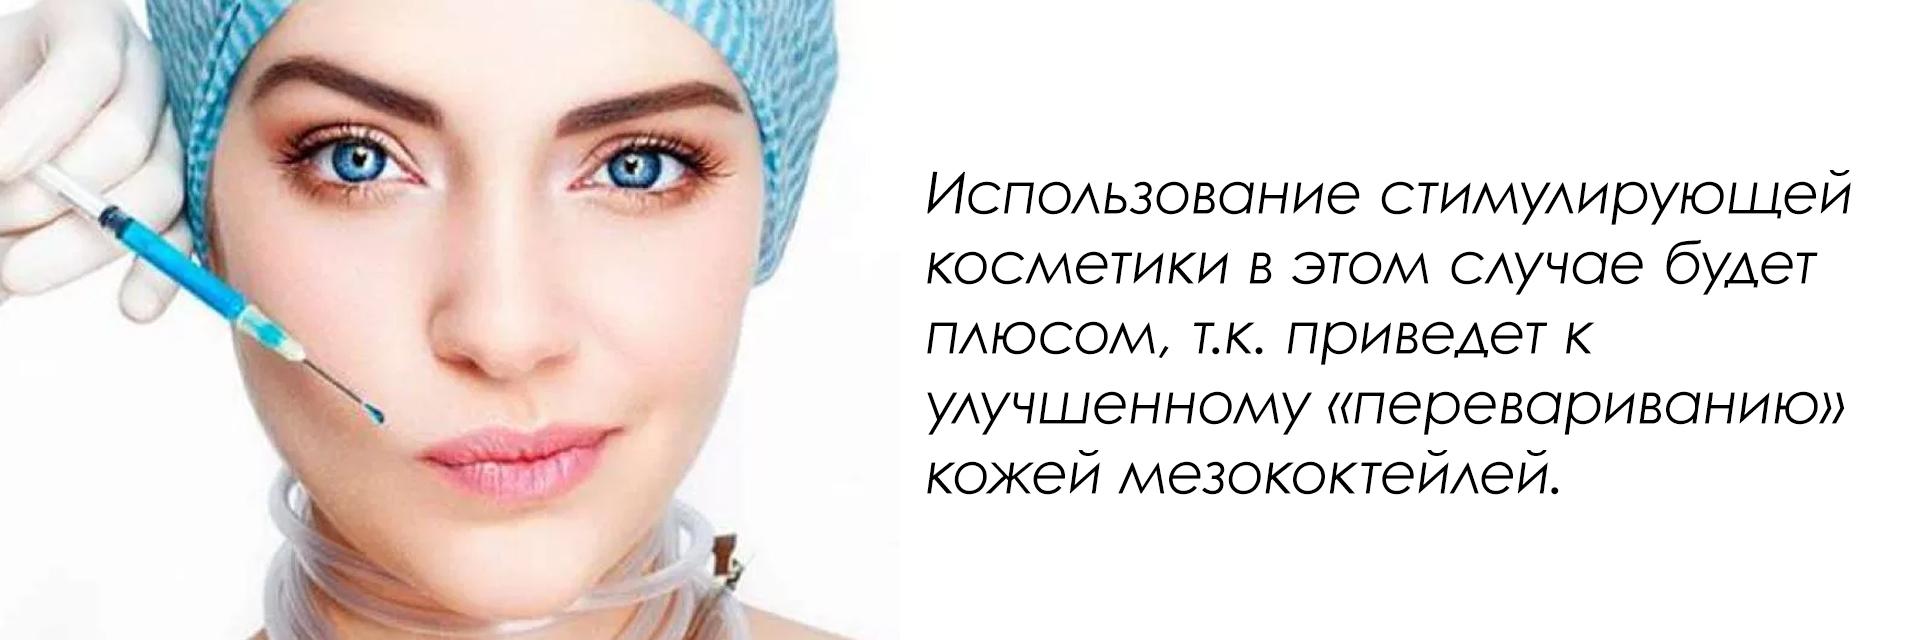 уколы красоты +для лица после